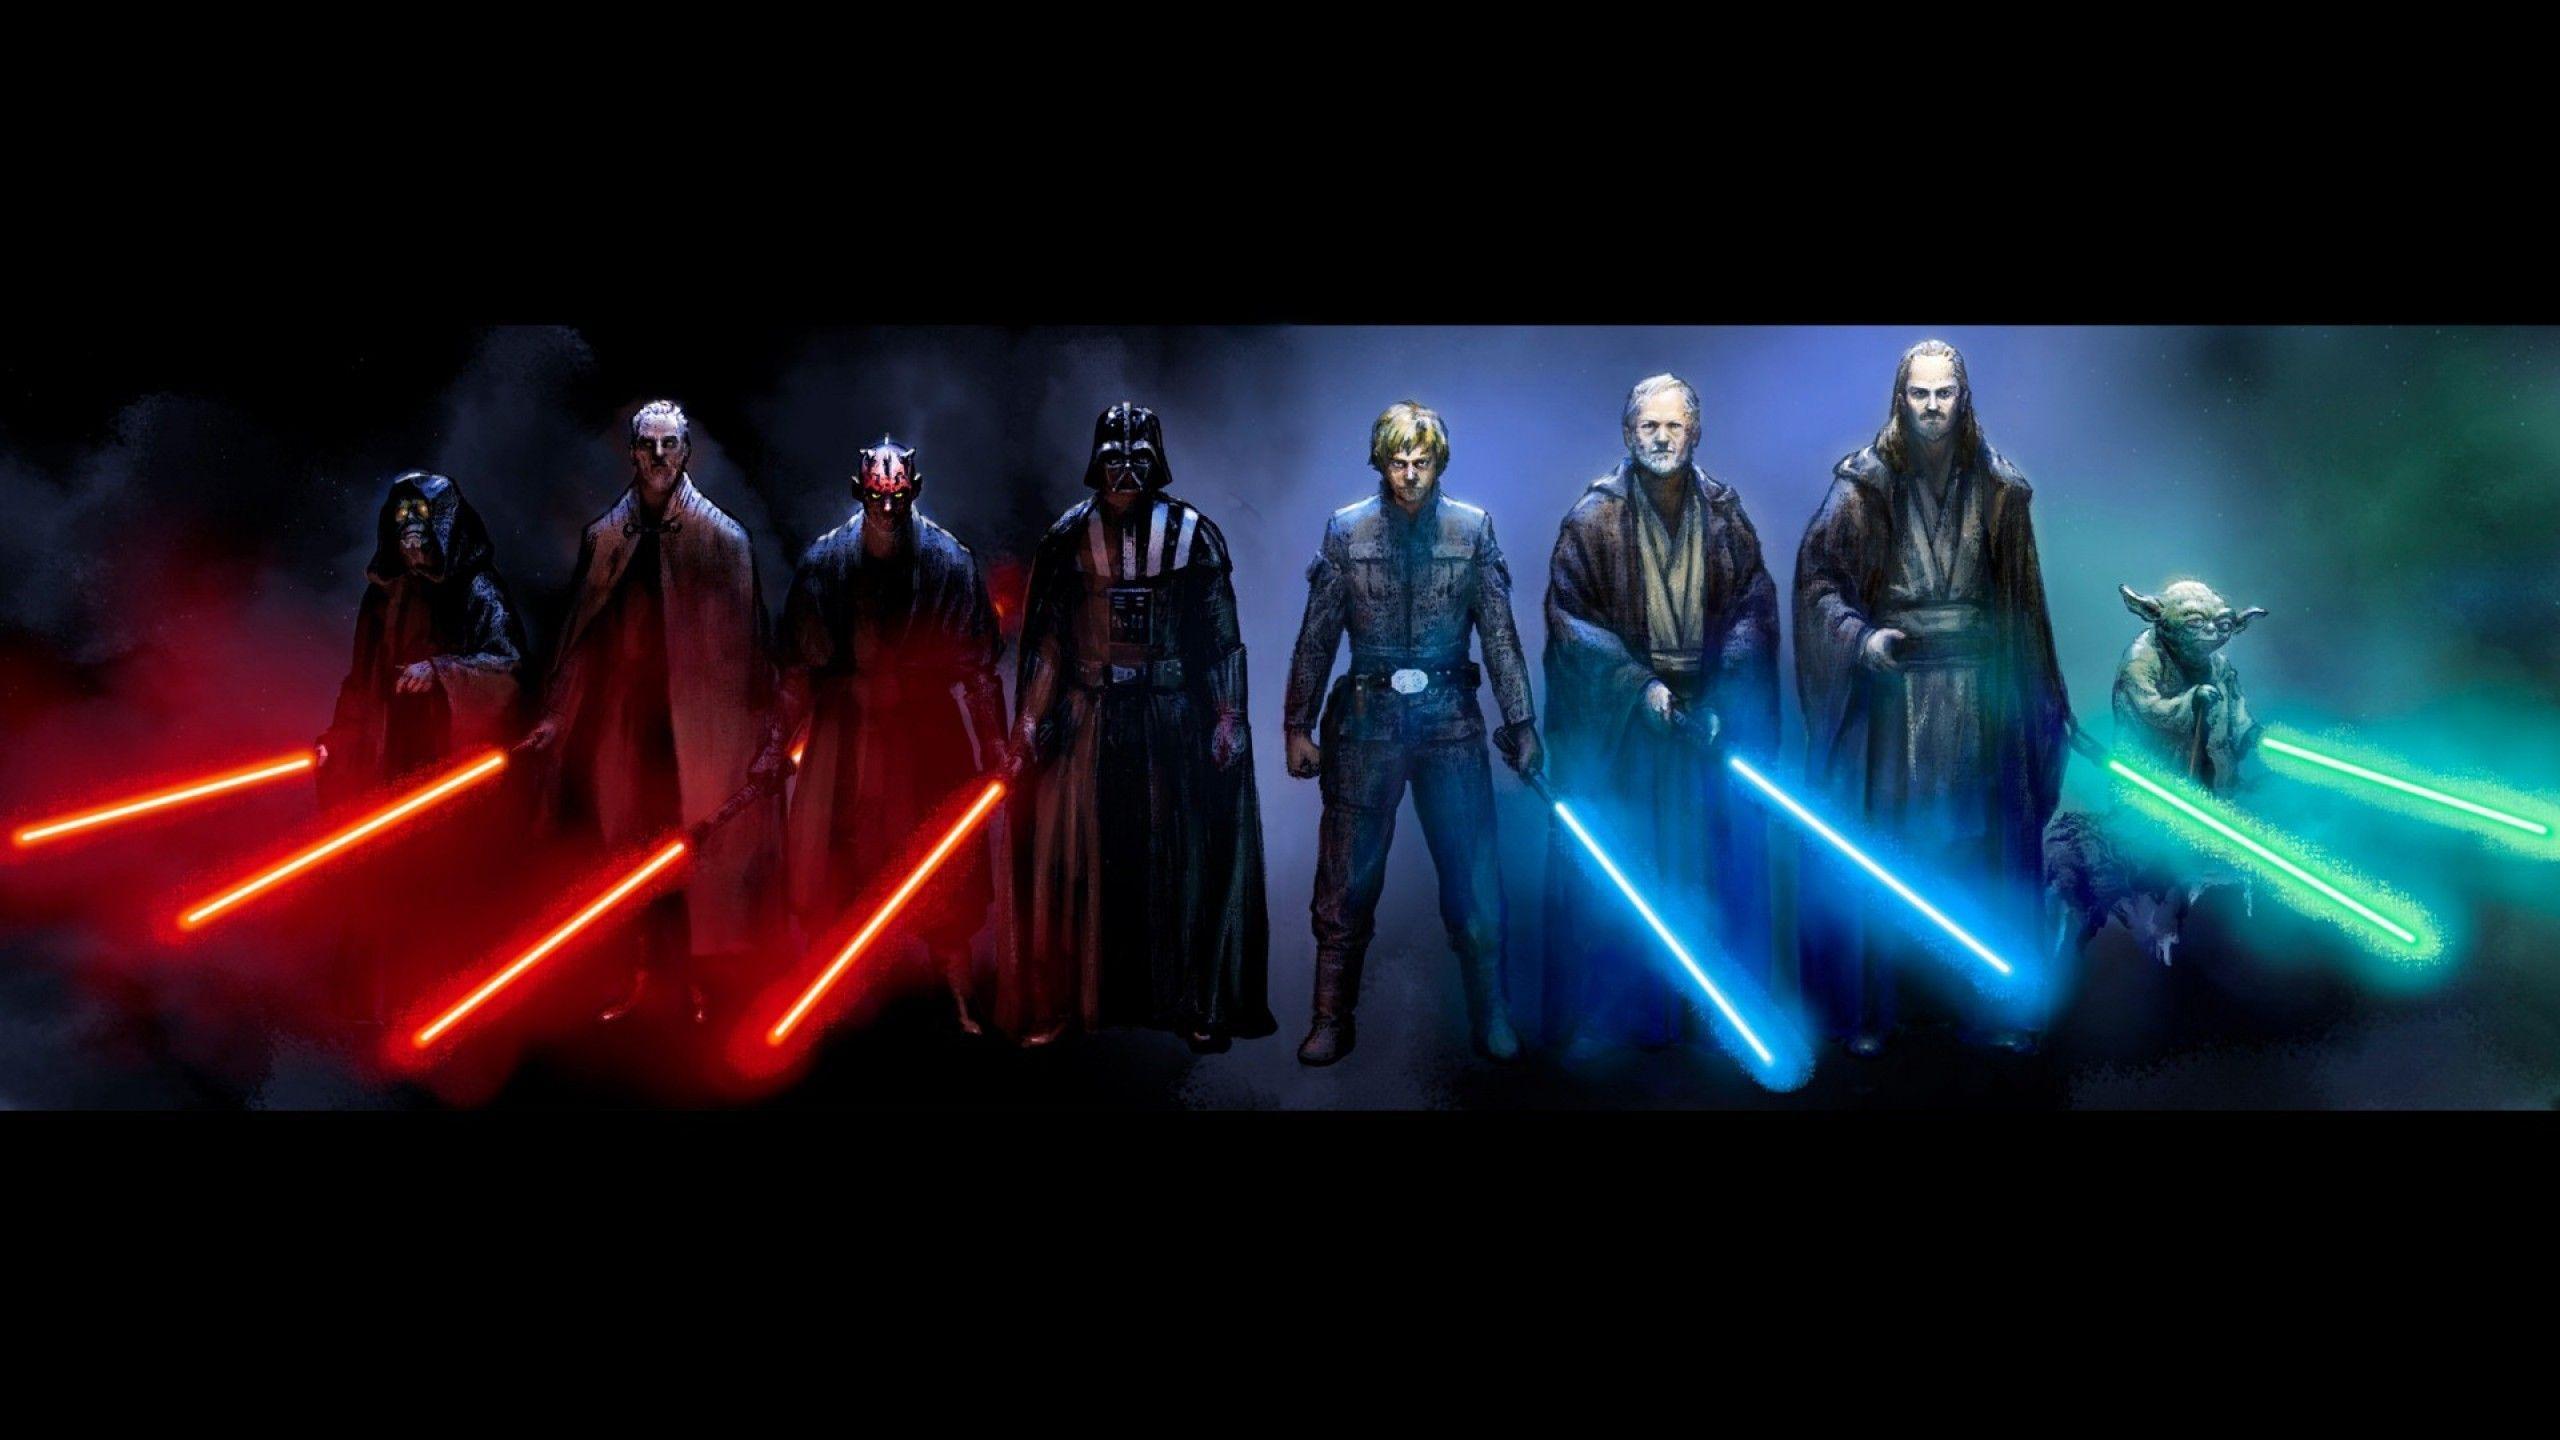 Cool Star Wars Desktop Wallpapers Top Free Cool Star Wars Desktop Backgrounds Wallpaperaccess